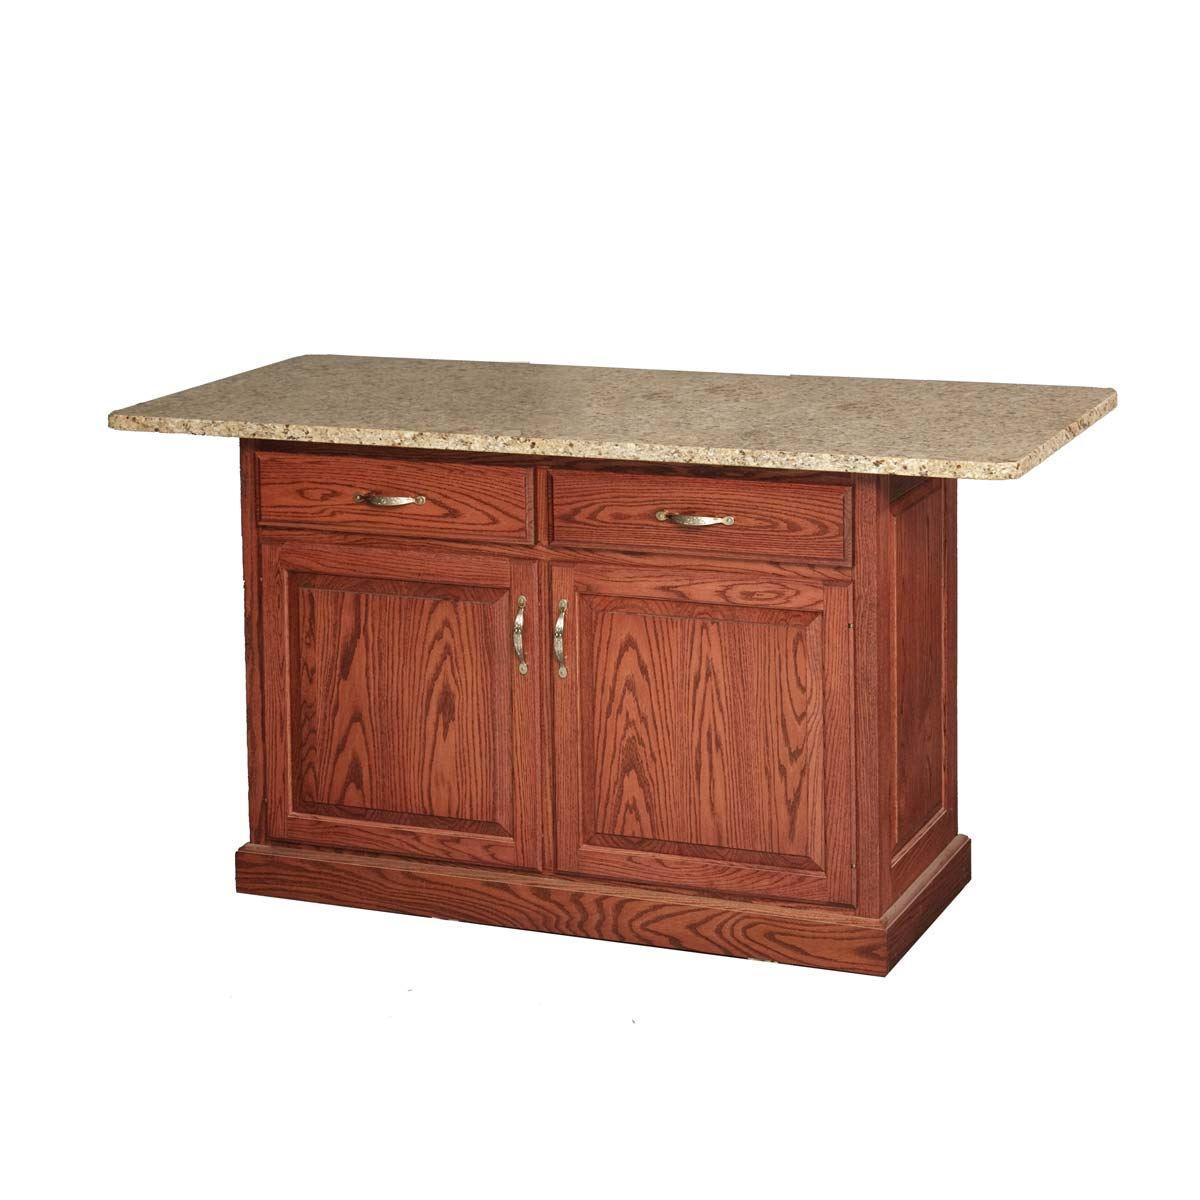 bar tops kitchen island tops kitchen island tops mefunnysideup kitchen island granite top sun